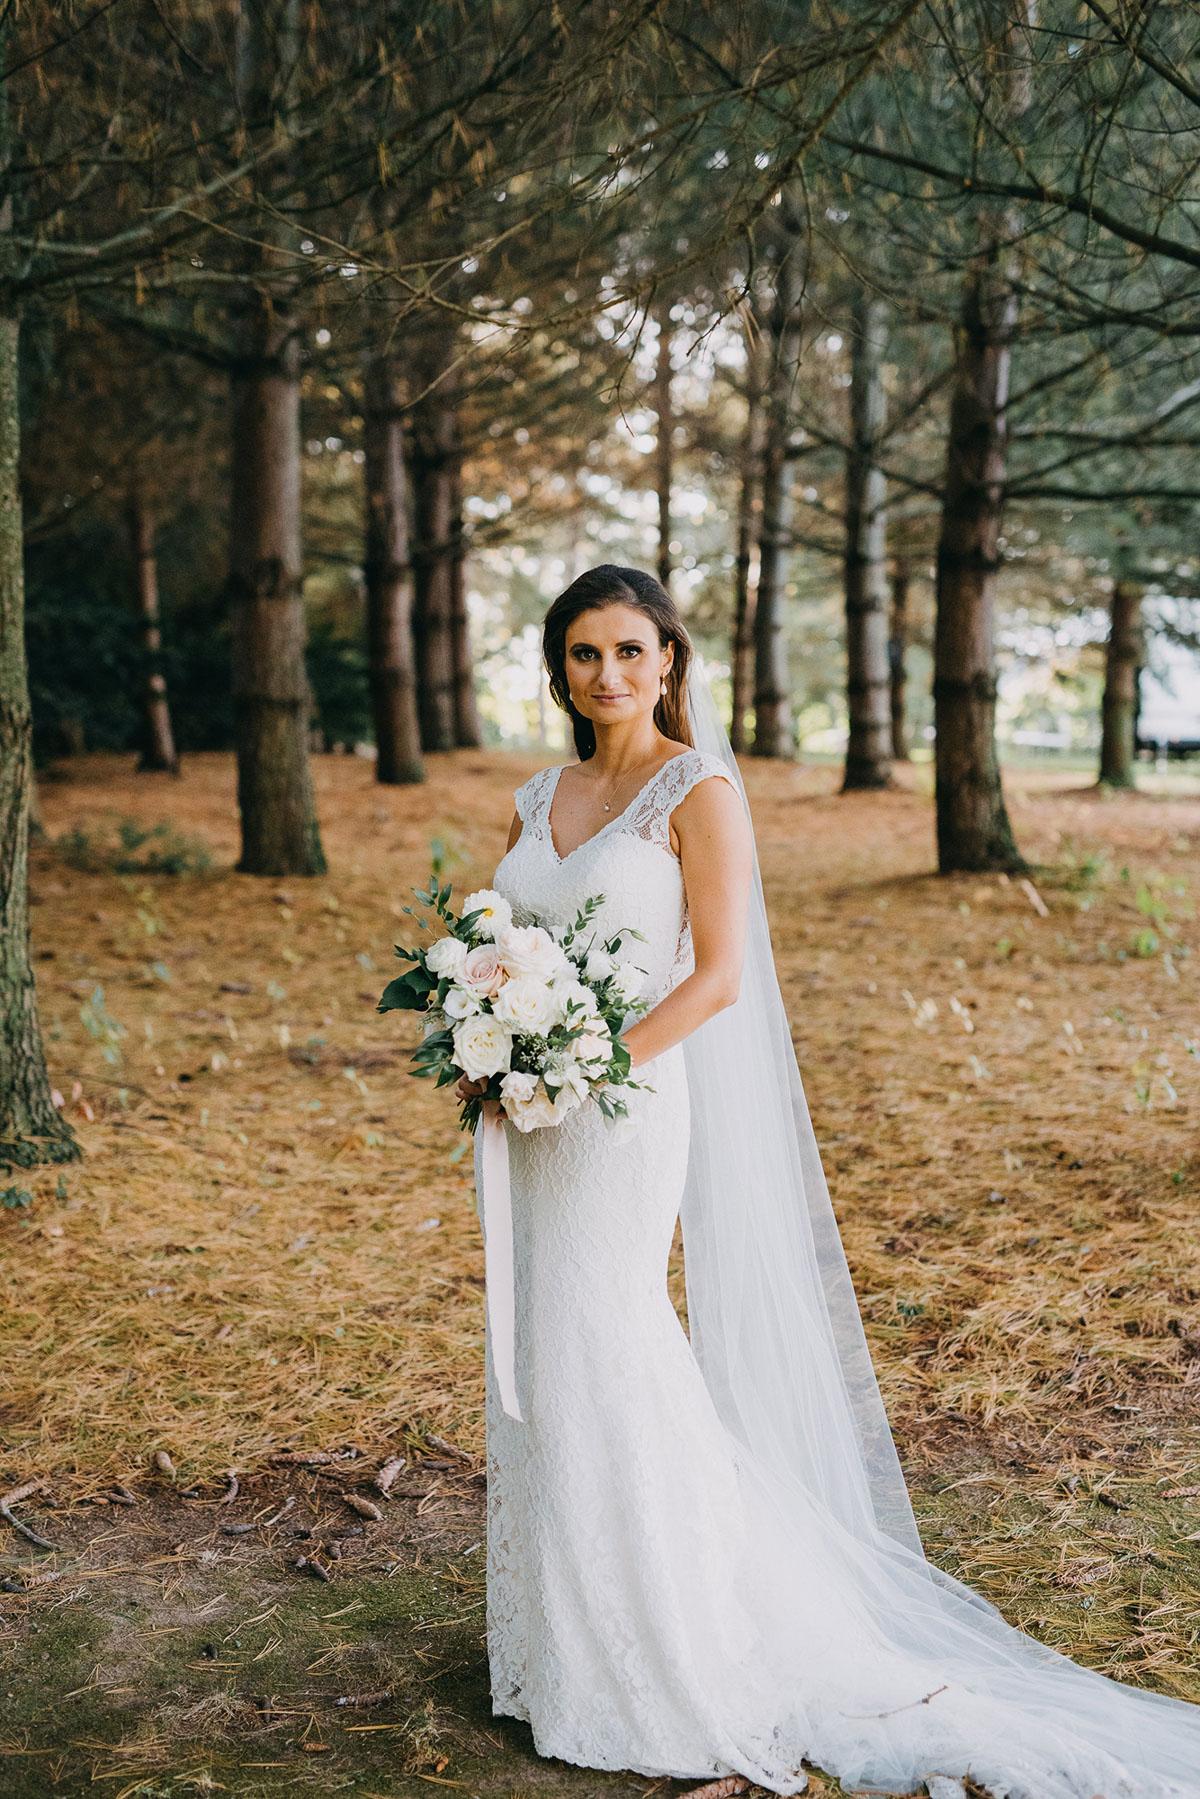 shaw-events-vineyard-bride-swish-list-kurtz-orchards-niagara-on-the-lake-wedding-89.jpg